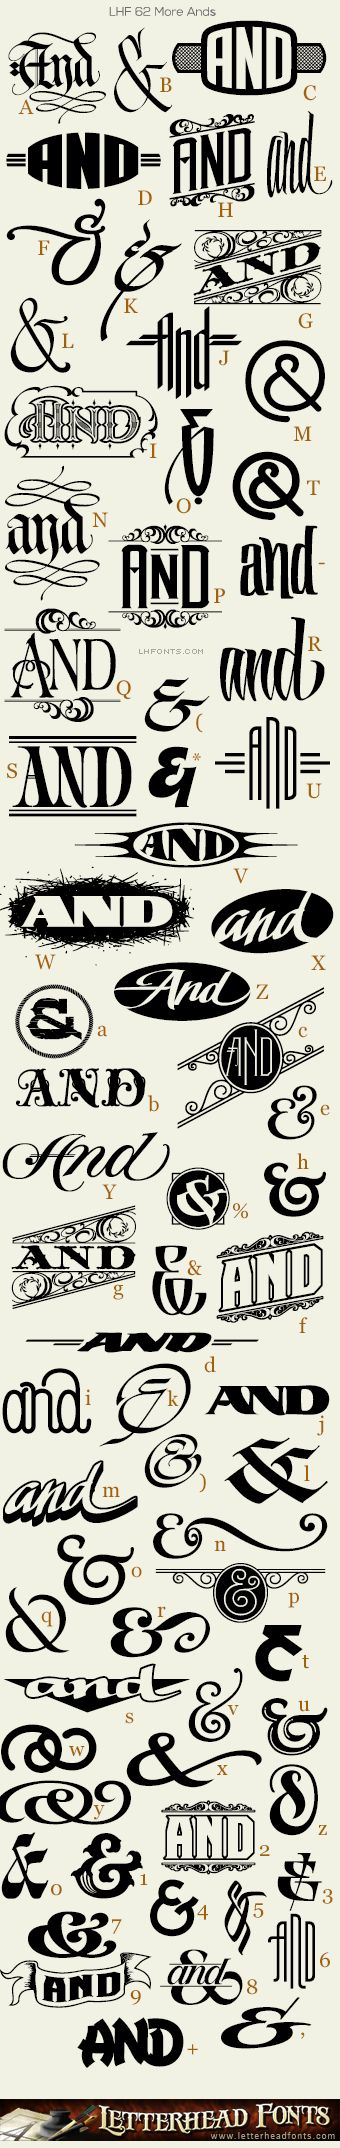 Letterhead Fonts / LHF 62 More Ands font / Decorative Ampersands